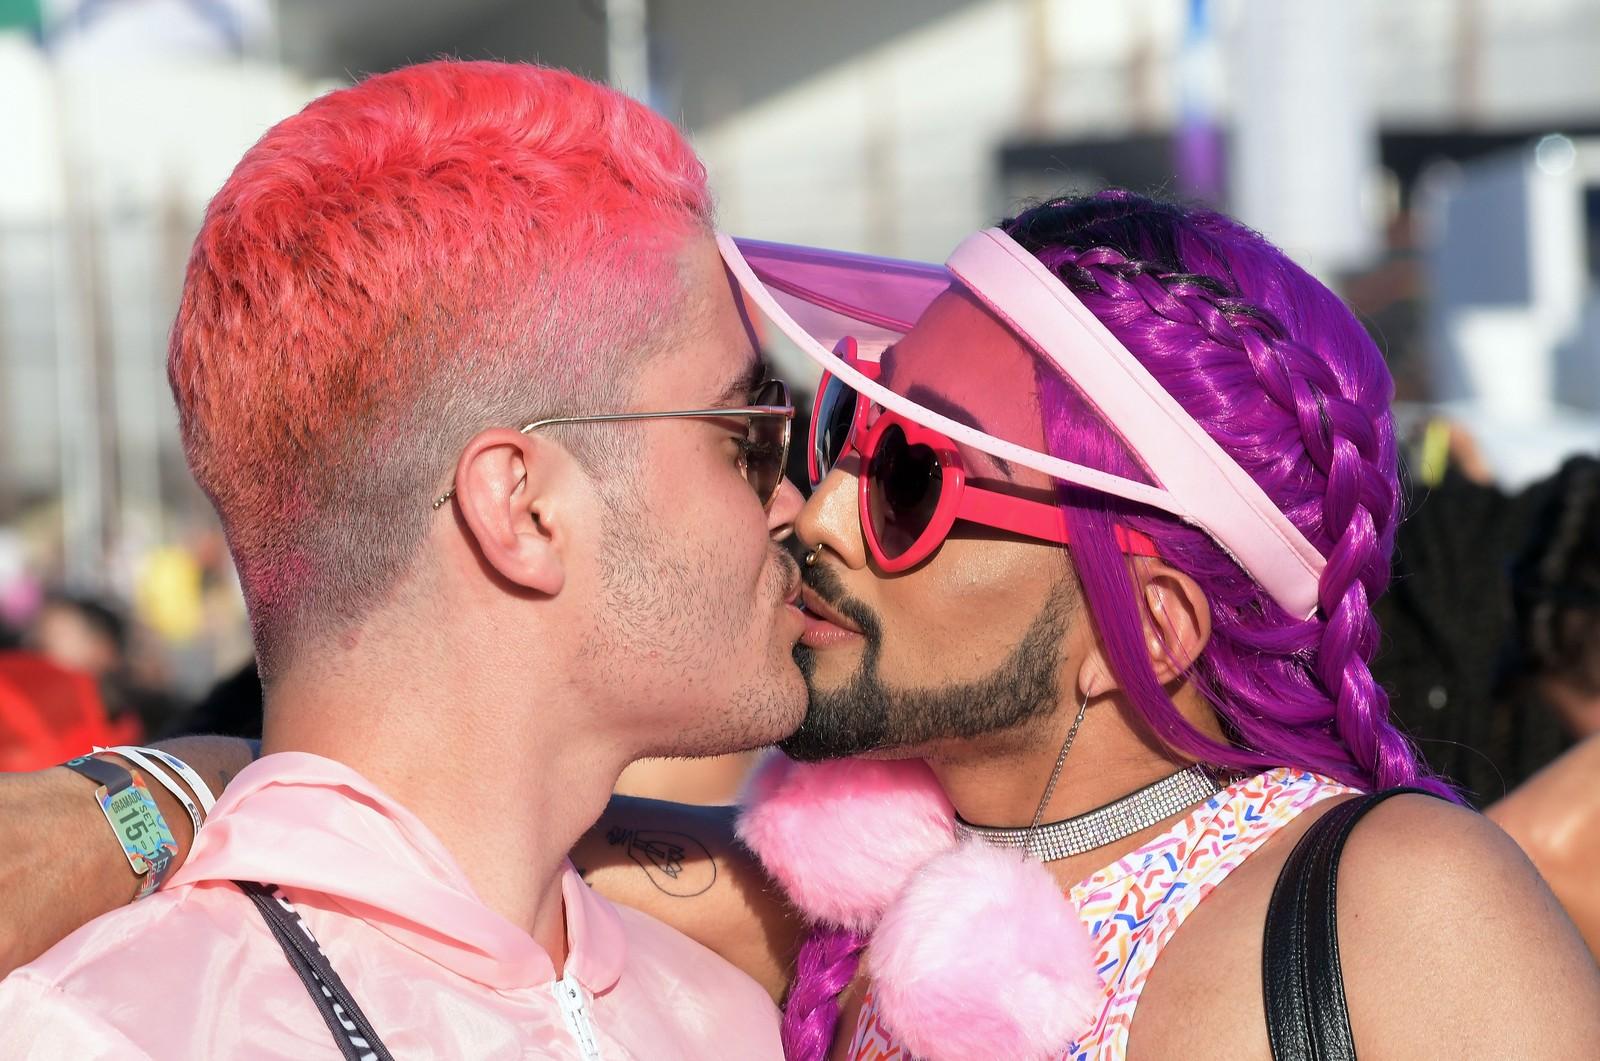 Casais do mesmo sexo colorem o primeiro dia do Rock in Rio; FOTOS